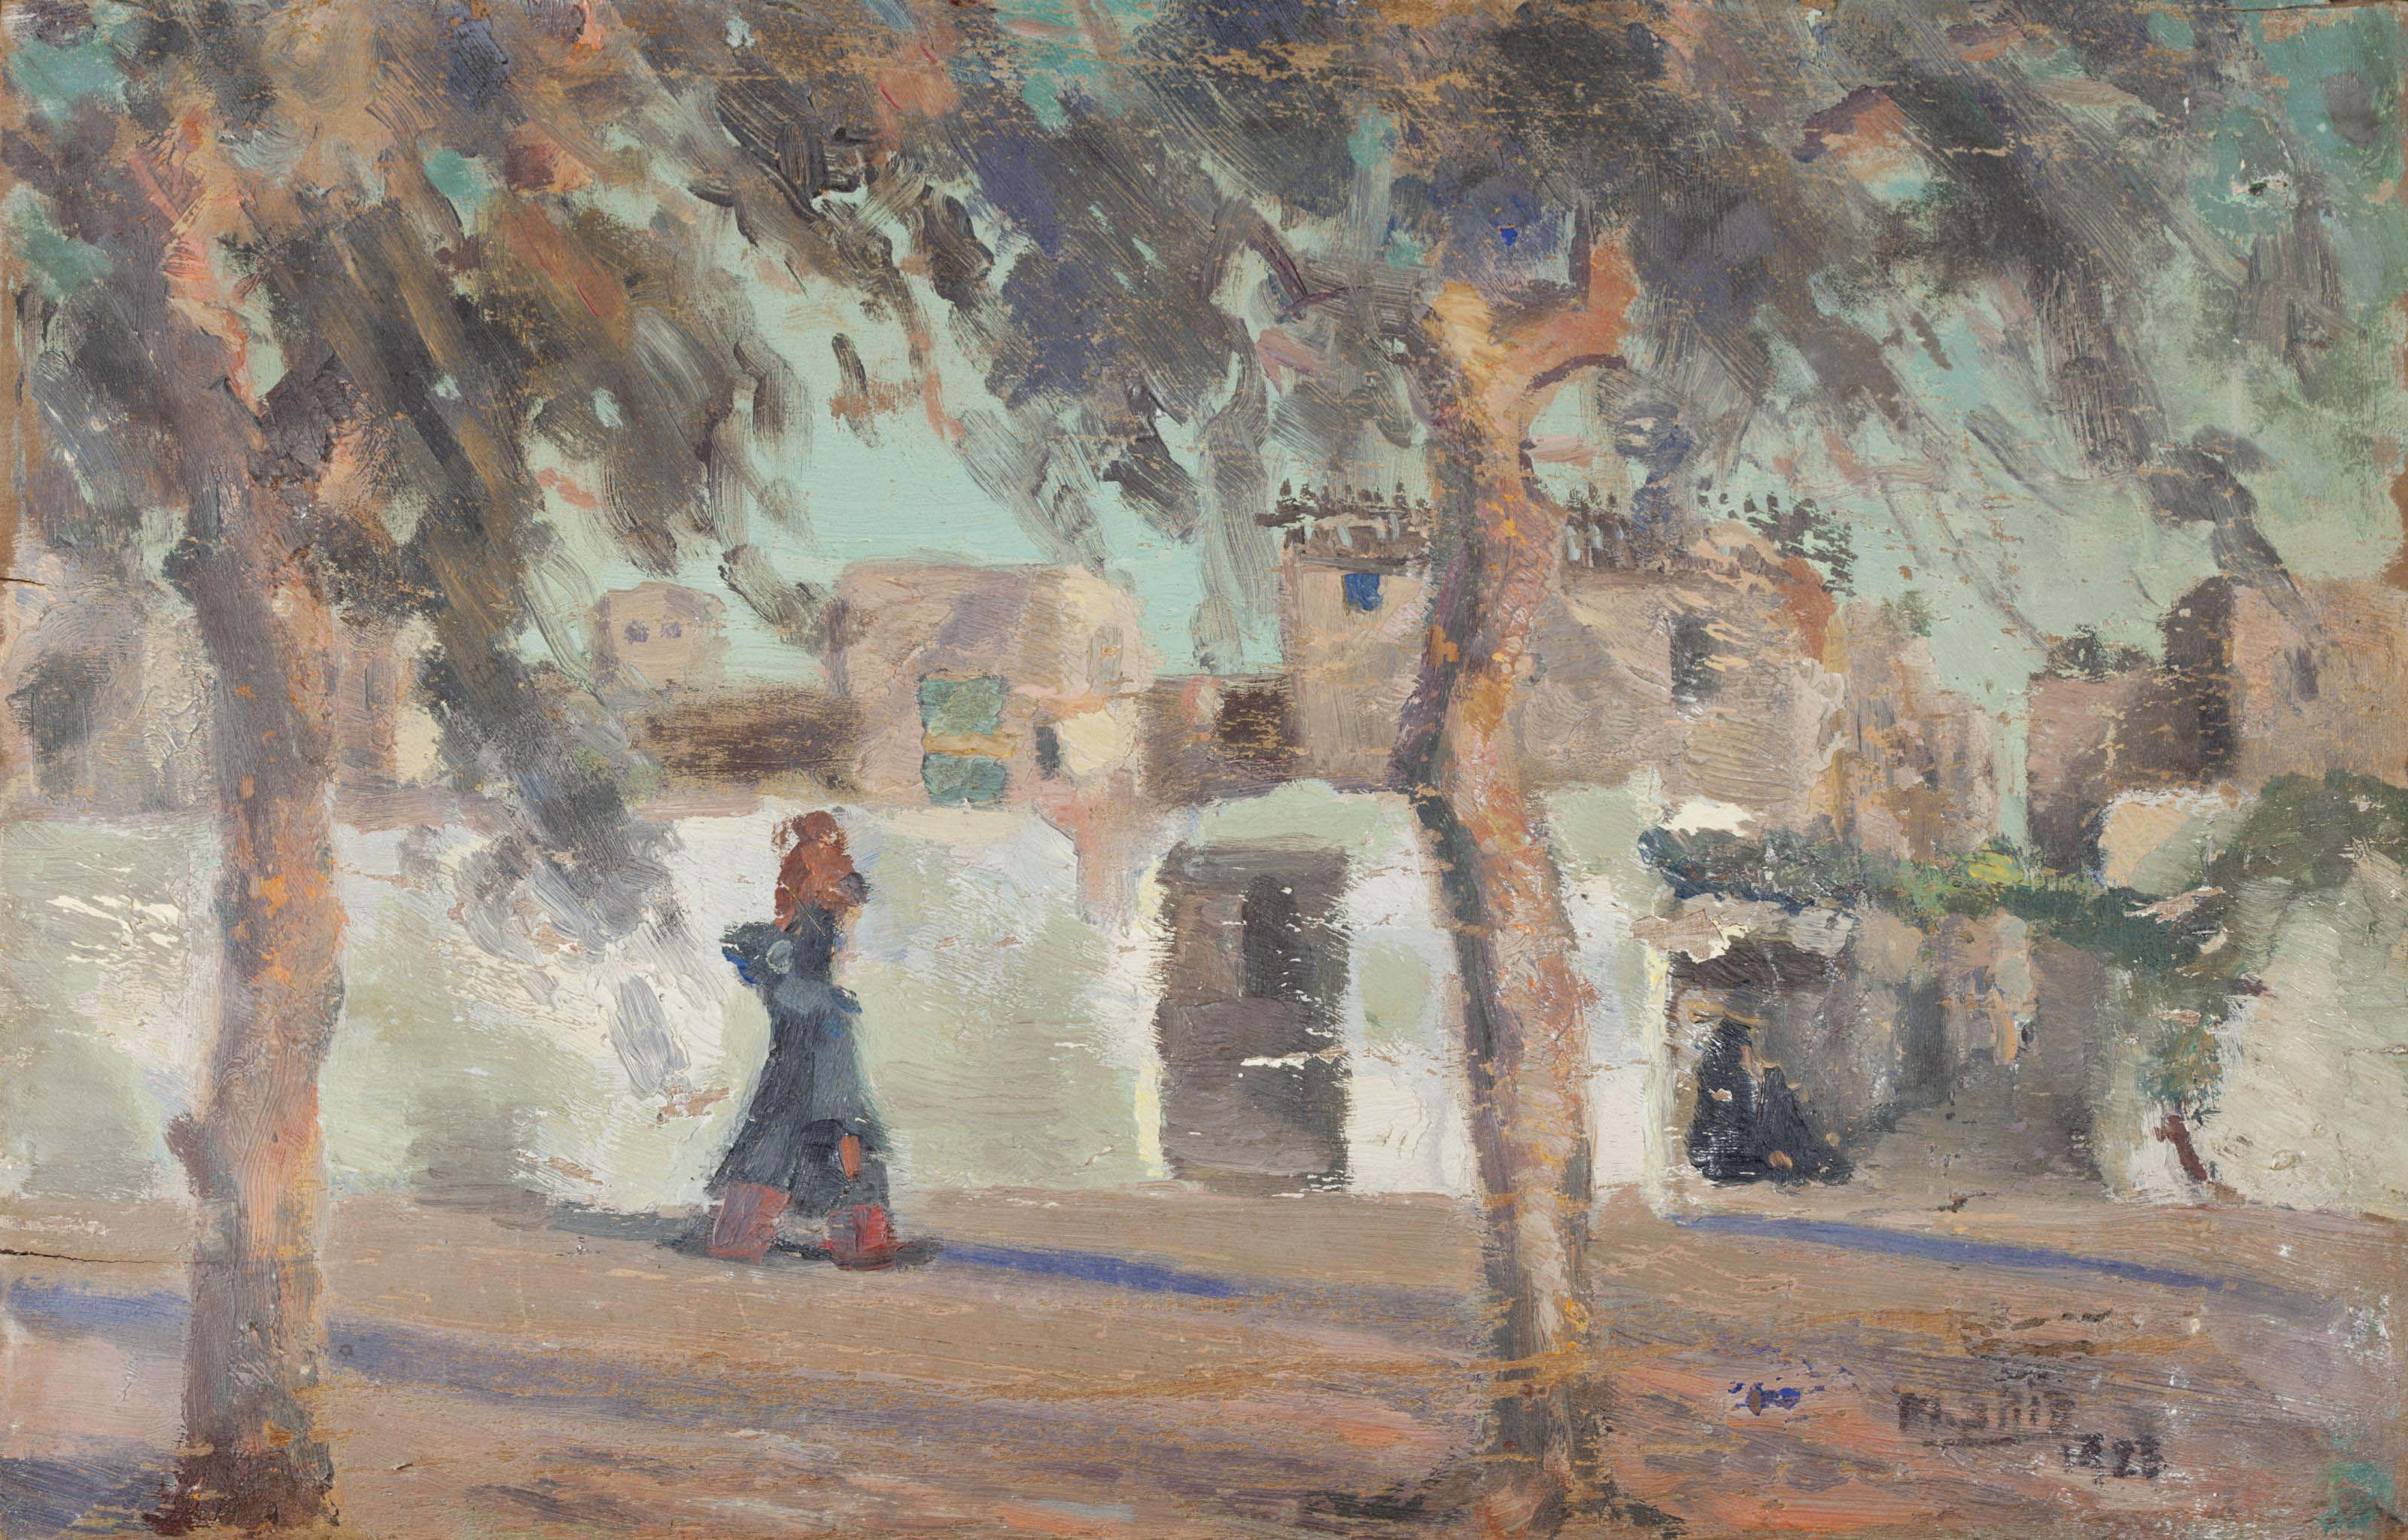 Mahmoud Saïd (Egyptian,1897-1964)